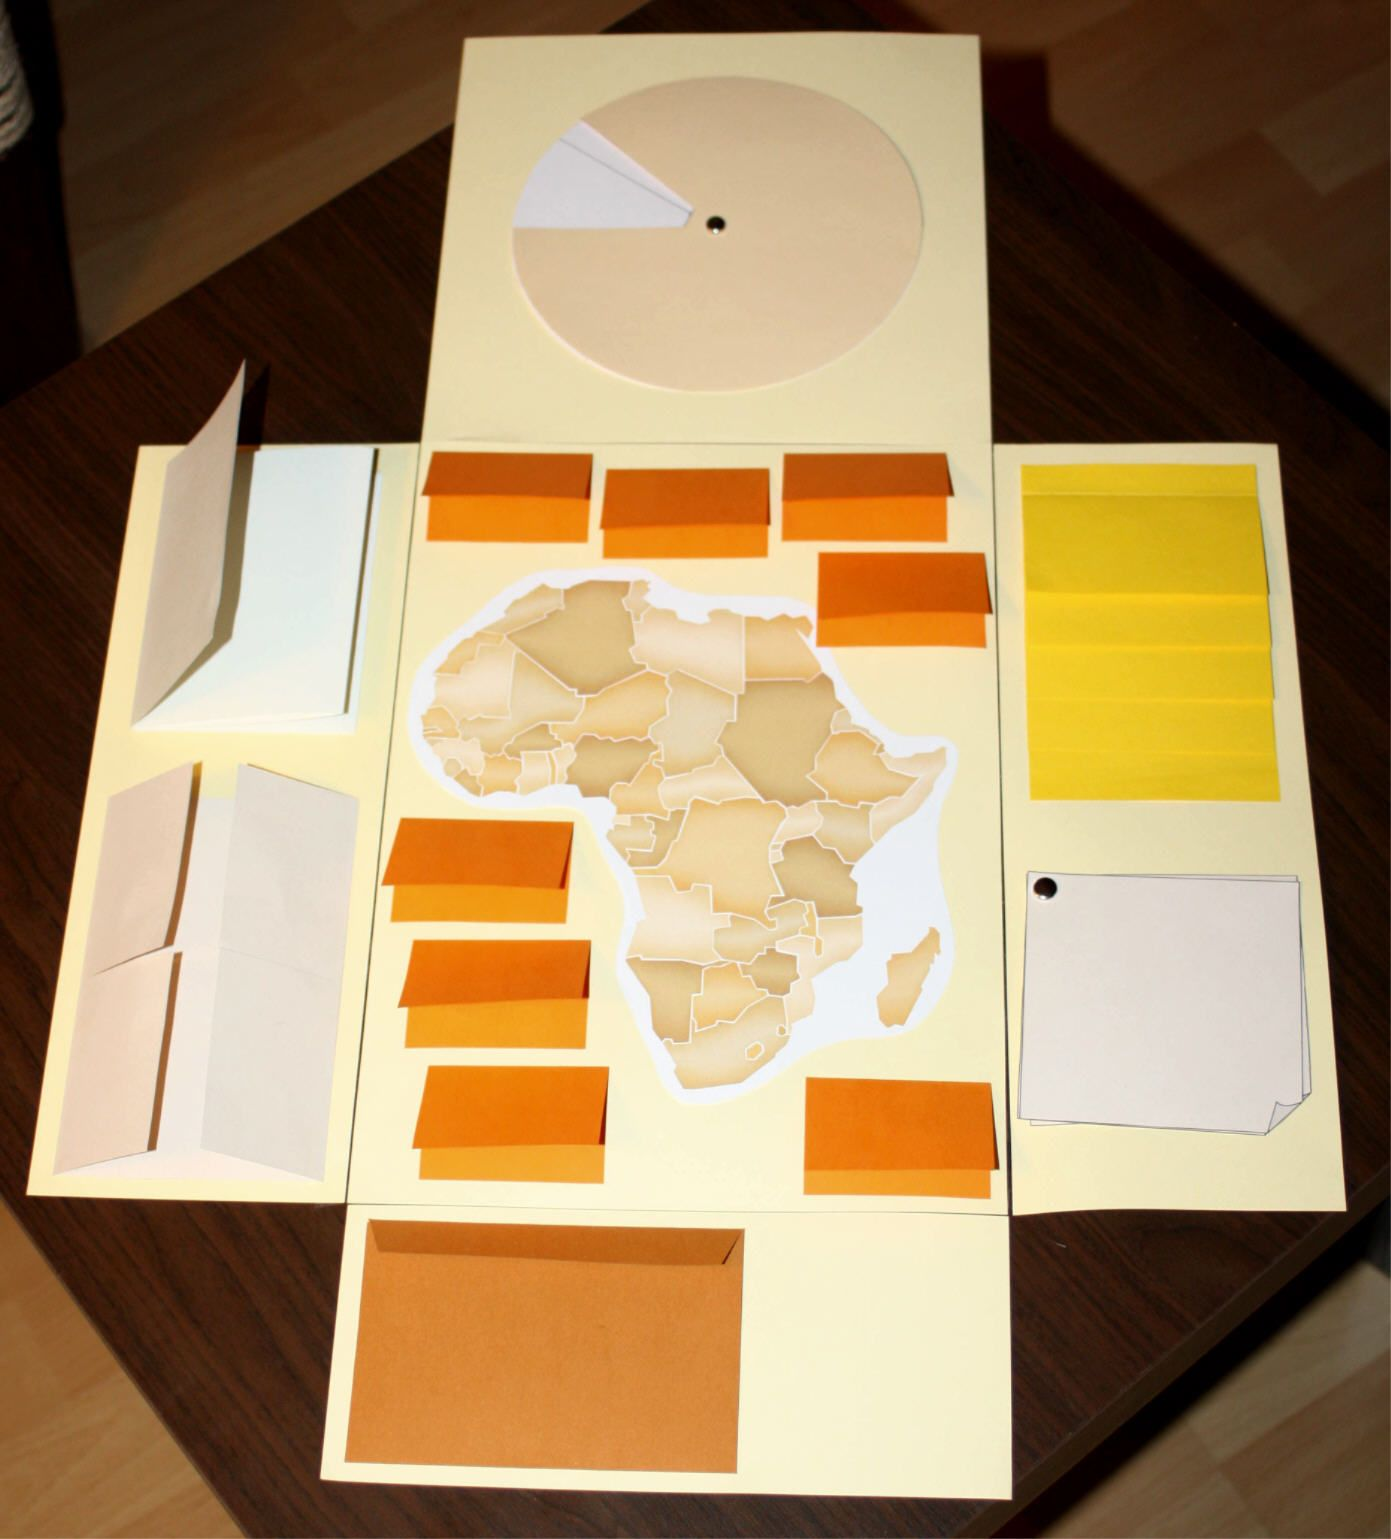 Grundschule Material kostenlos Arbeitsblätter | Afrika lapbook ...